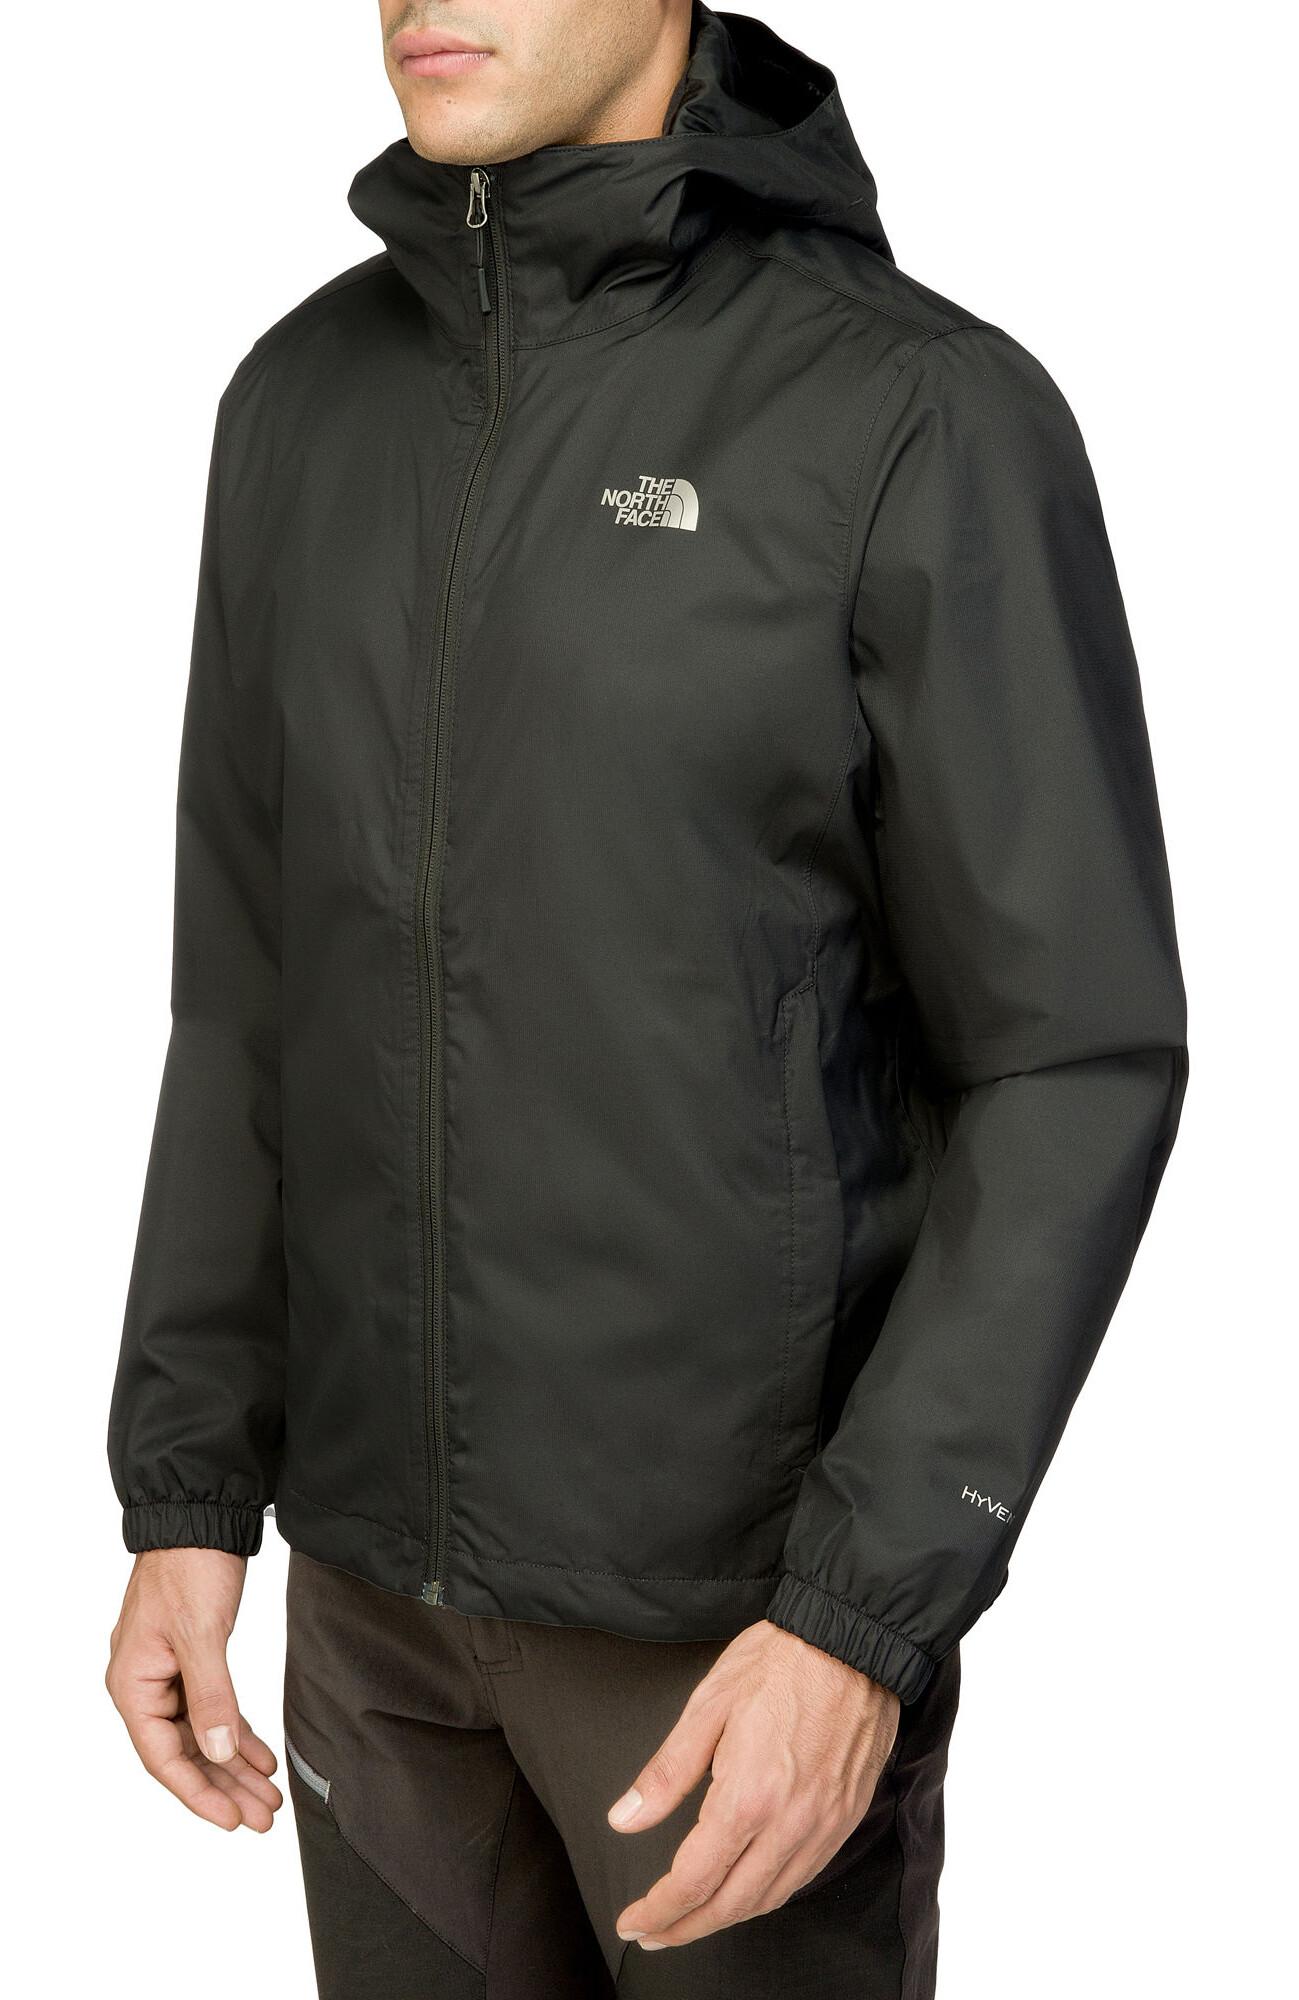 a0cdb2aee1 The North Face Quest Jacket Herren tnf black | campz.de